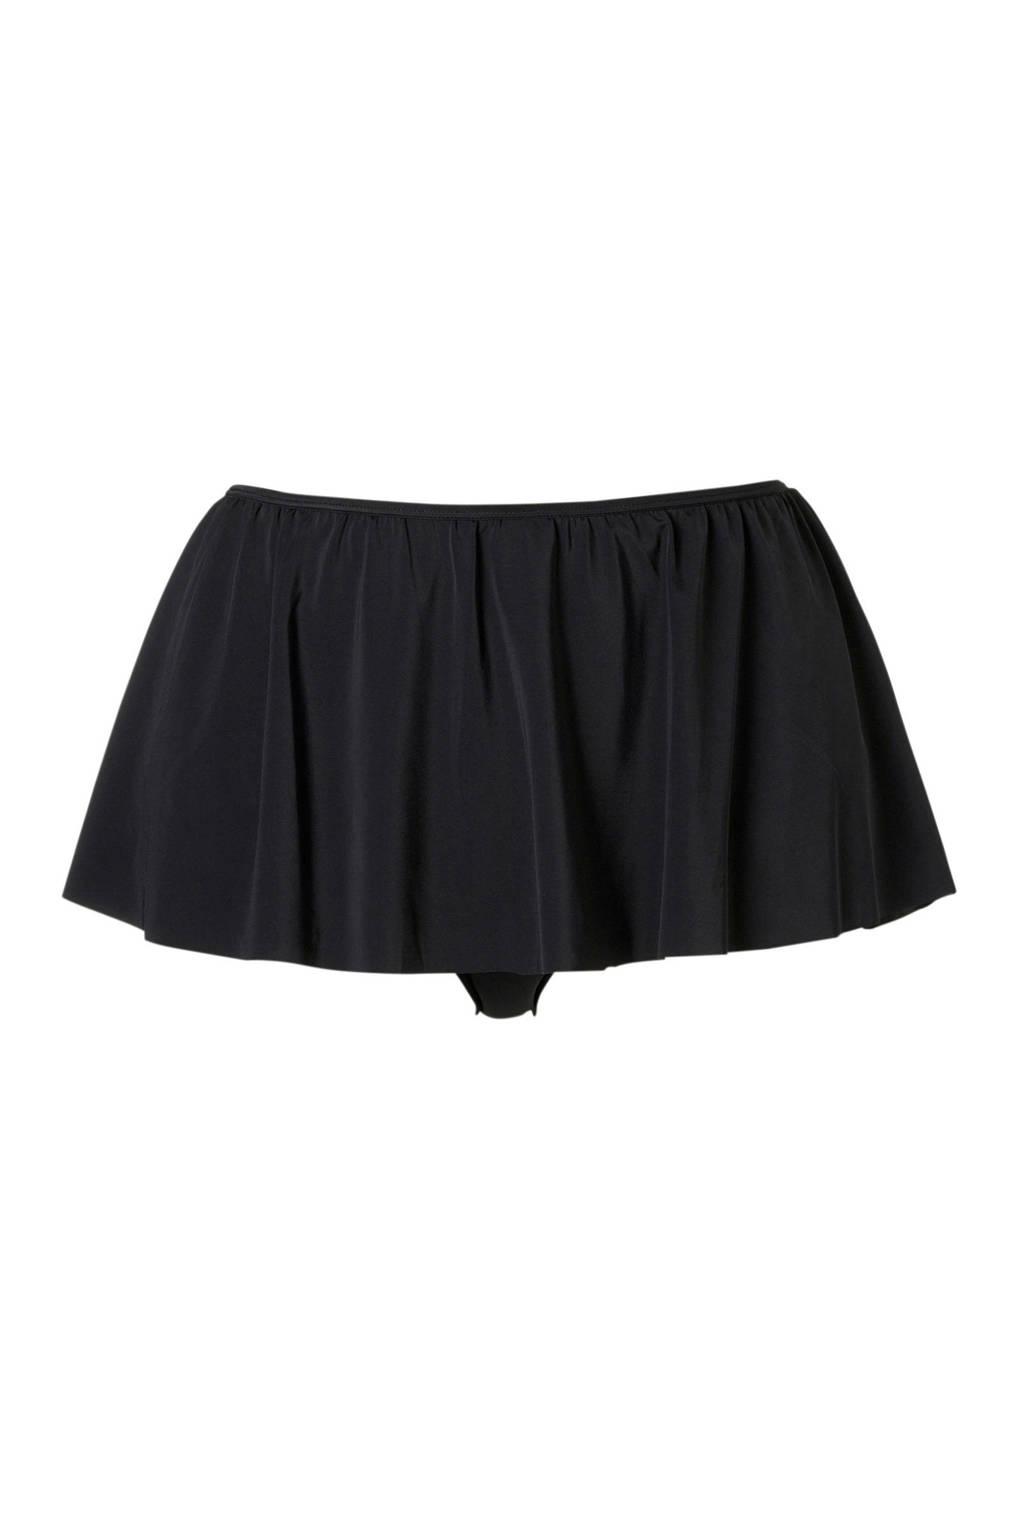 Zizzi corrigerende bikinibroekje +size zwart, Zwart